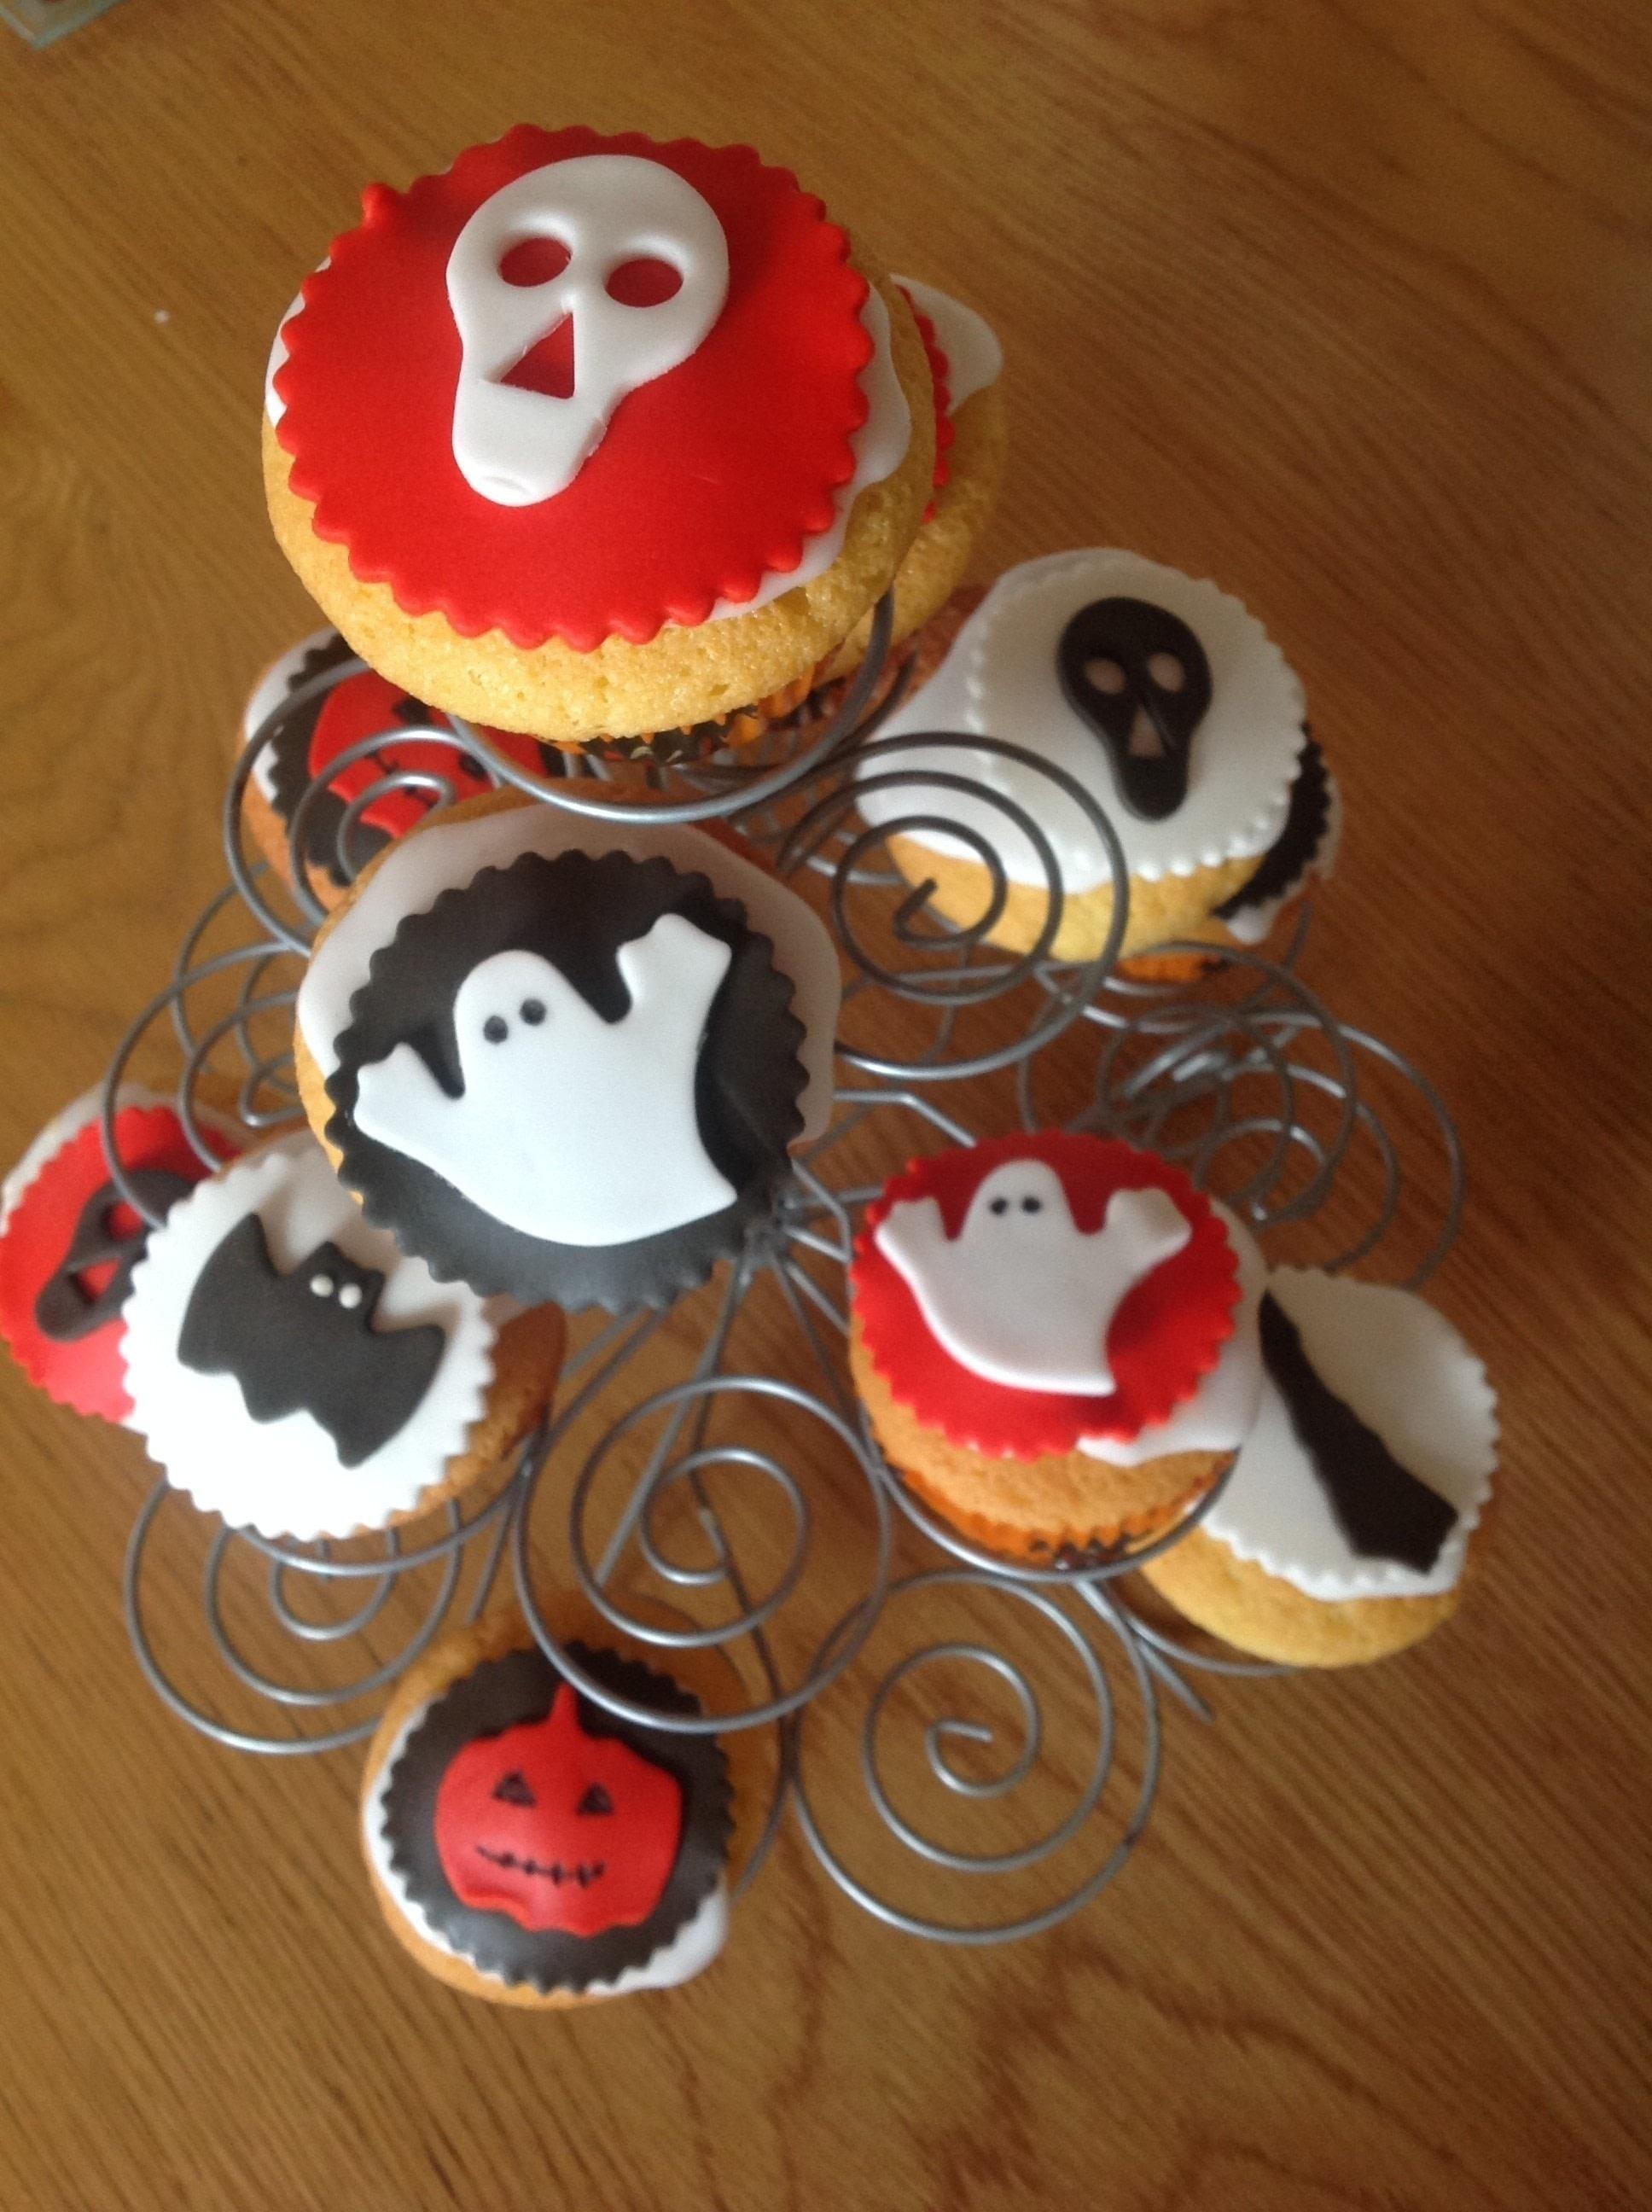 spooky halloween cupcakes · how to bake a sponge cake · recipes on